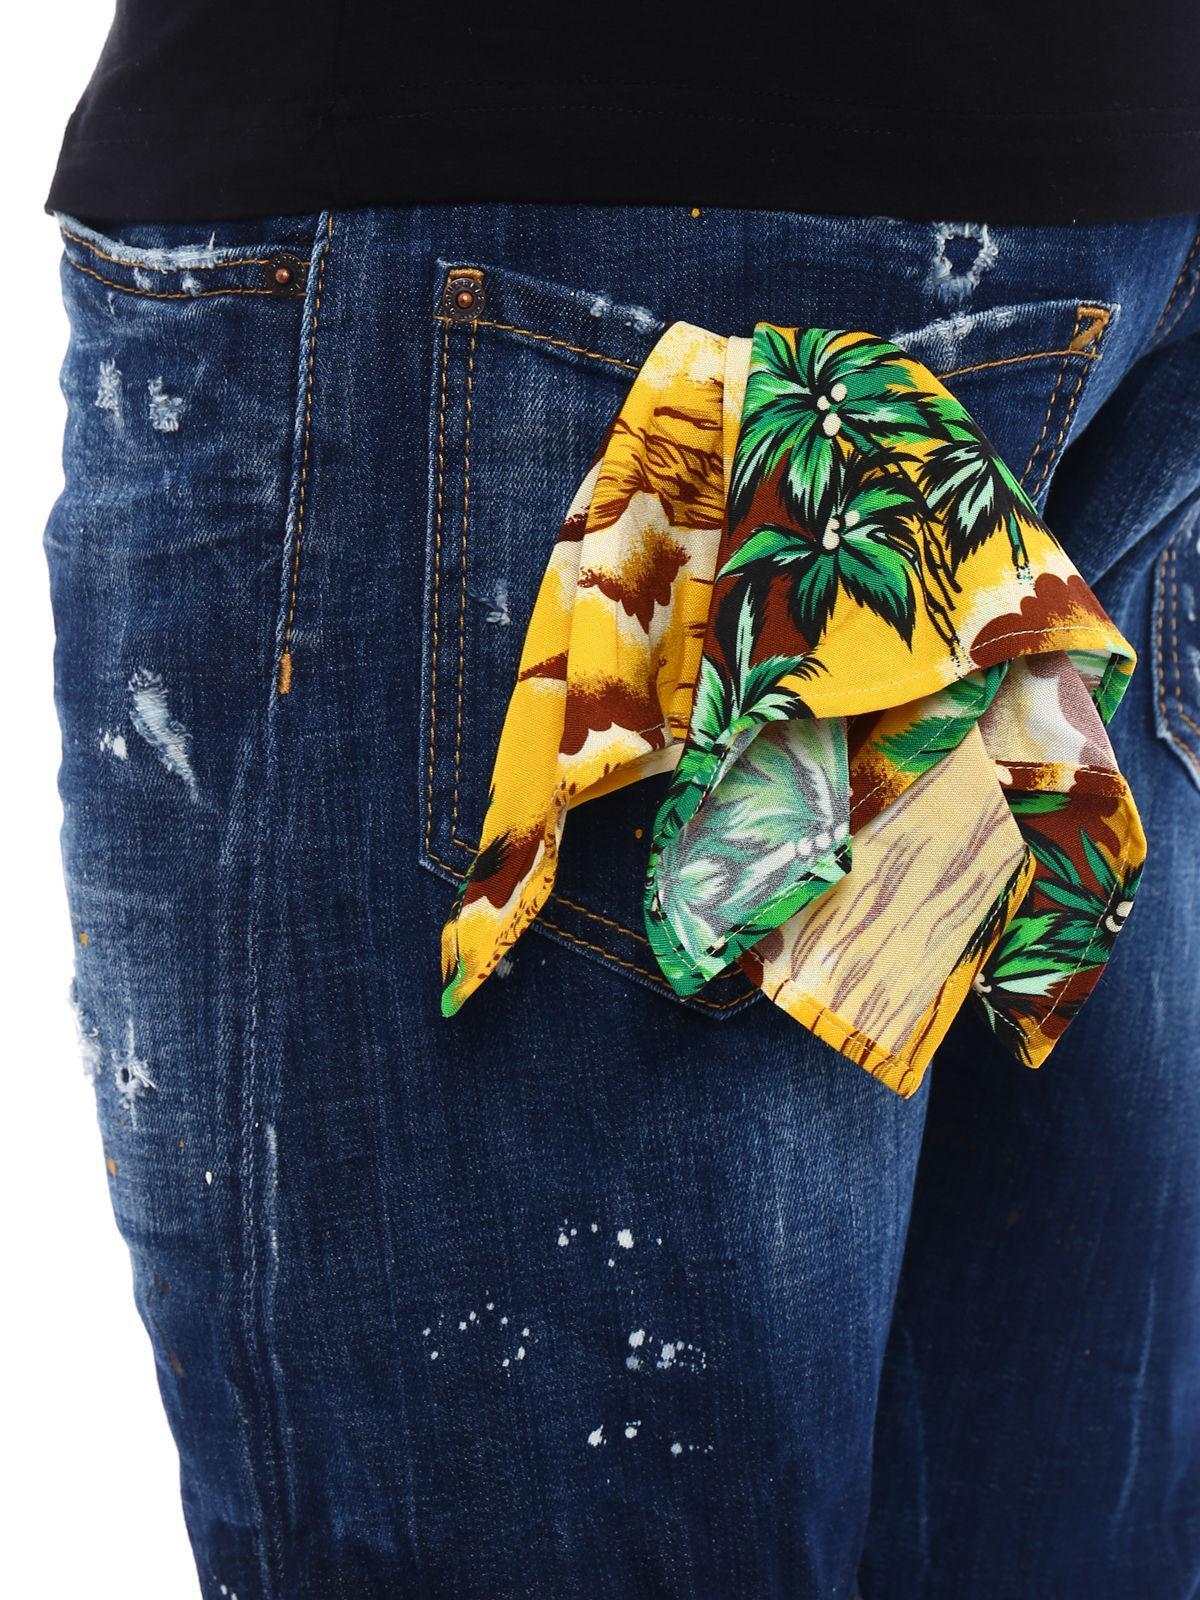 715d8c65 DSquared² Sexy Twist Denim Pocket Pochette Hawaii in Blue for Men - Lyst